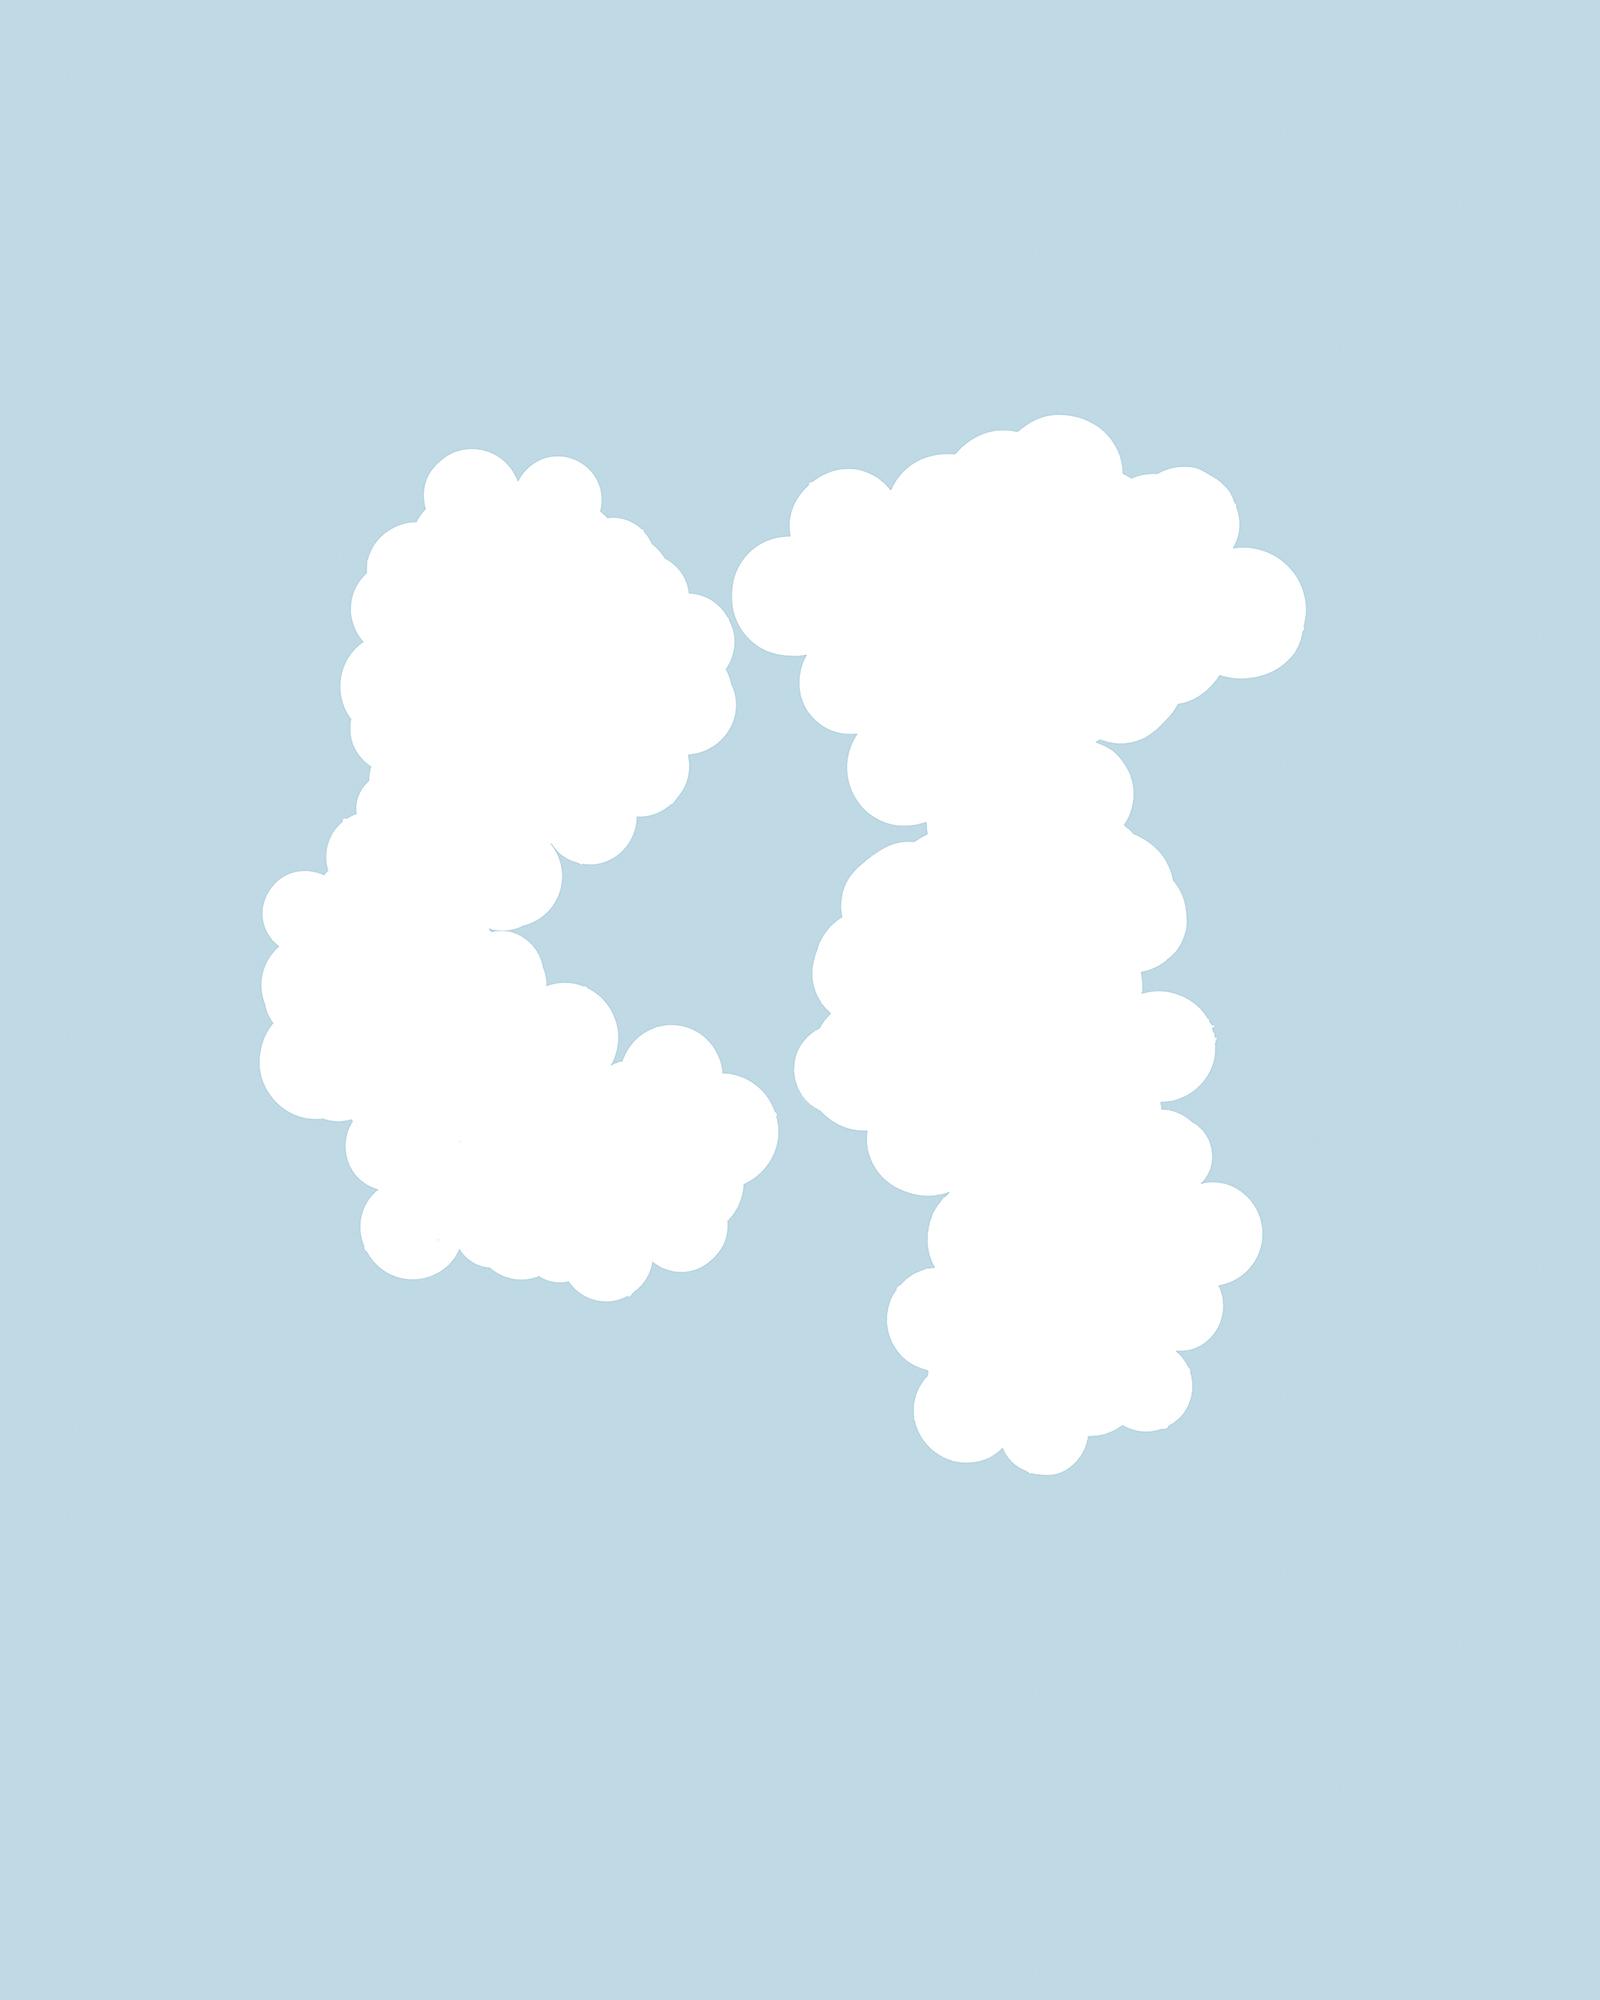 16. Untitled (gray cluster 34&24&33 v2). 2018. Inkjet print on mulberry paper.